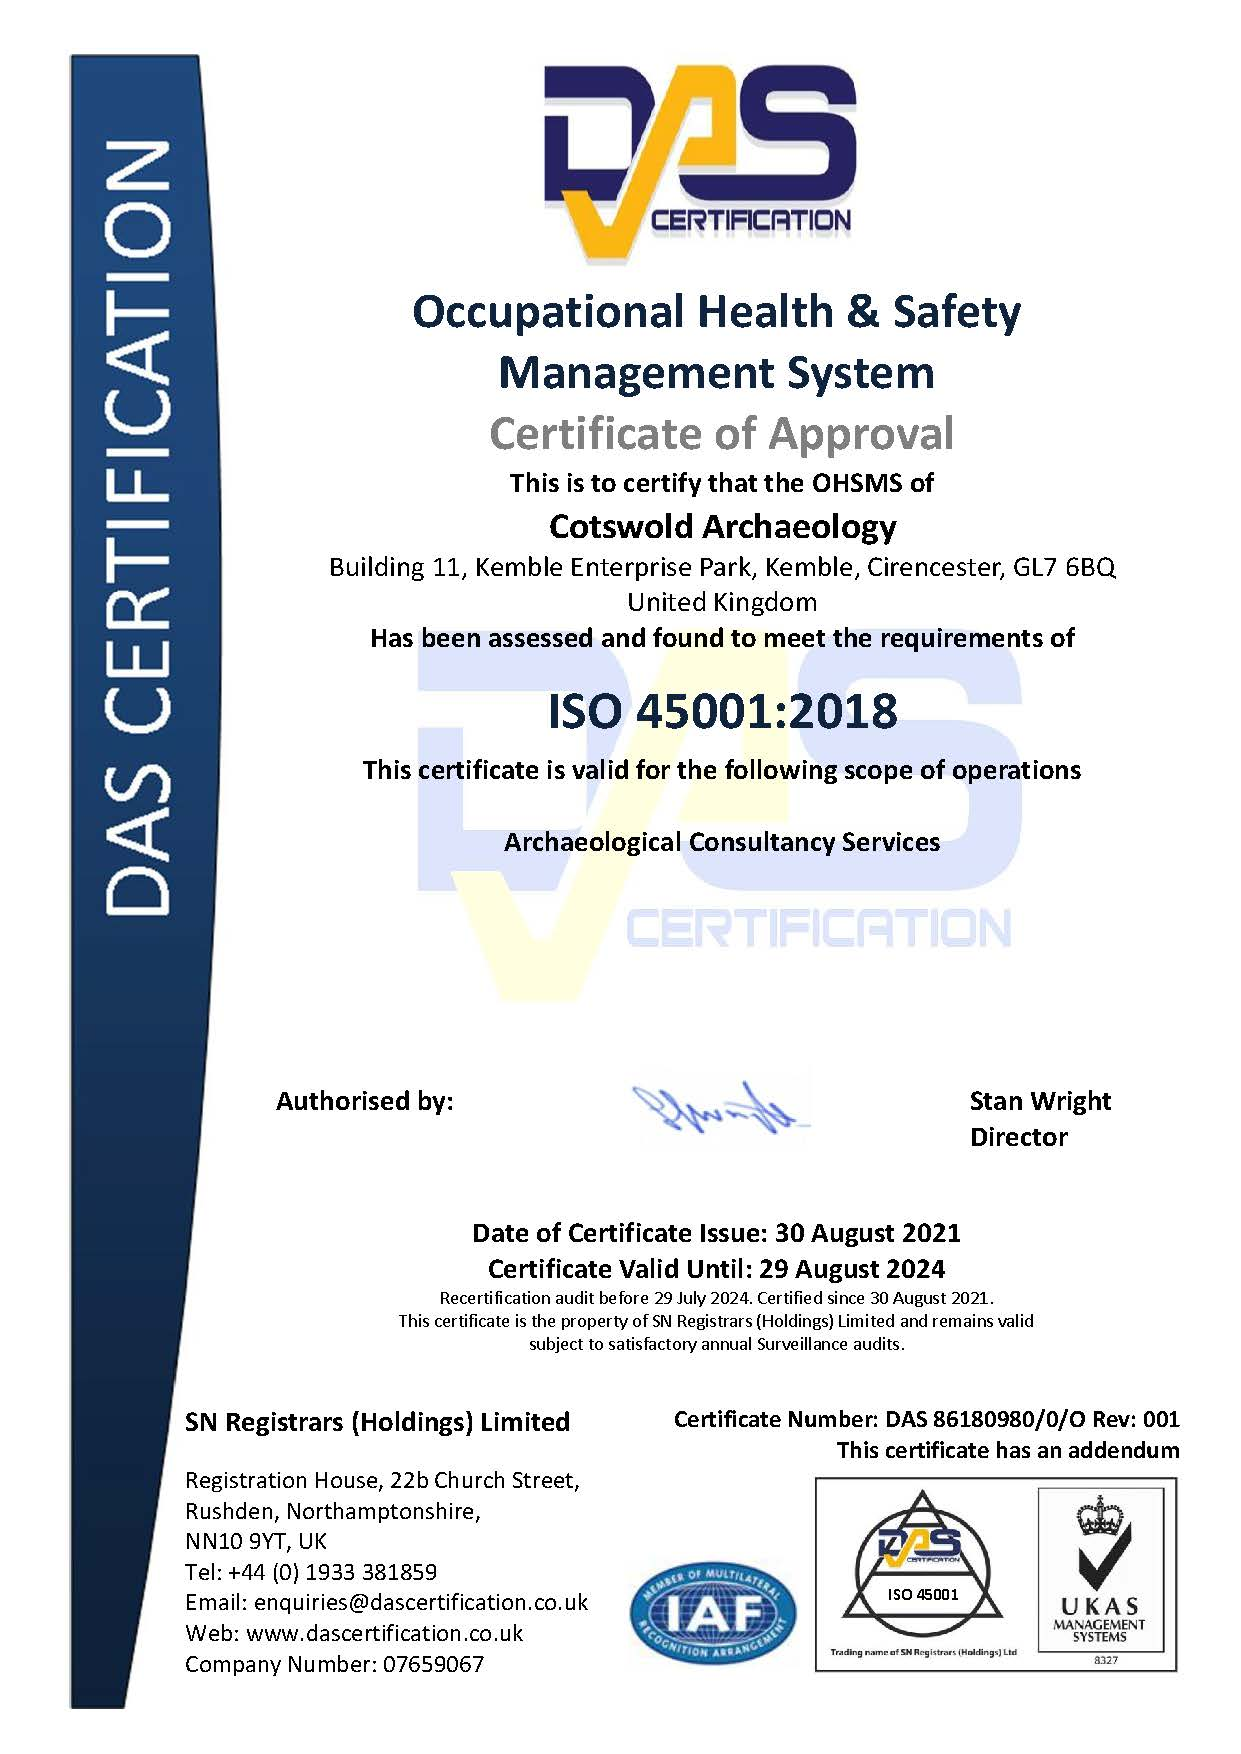 ISO 45001 ceritficate